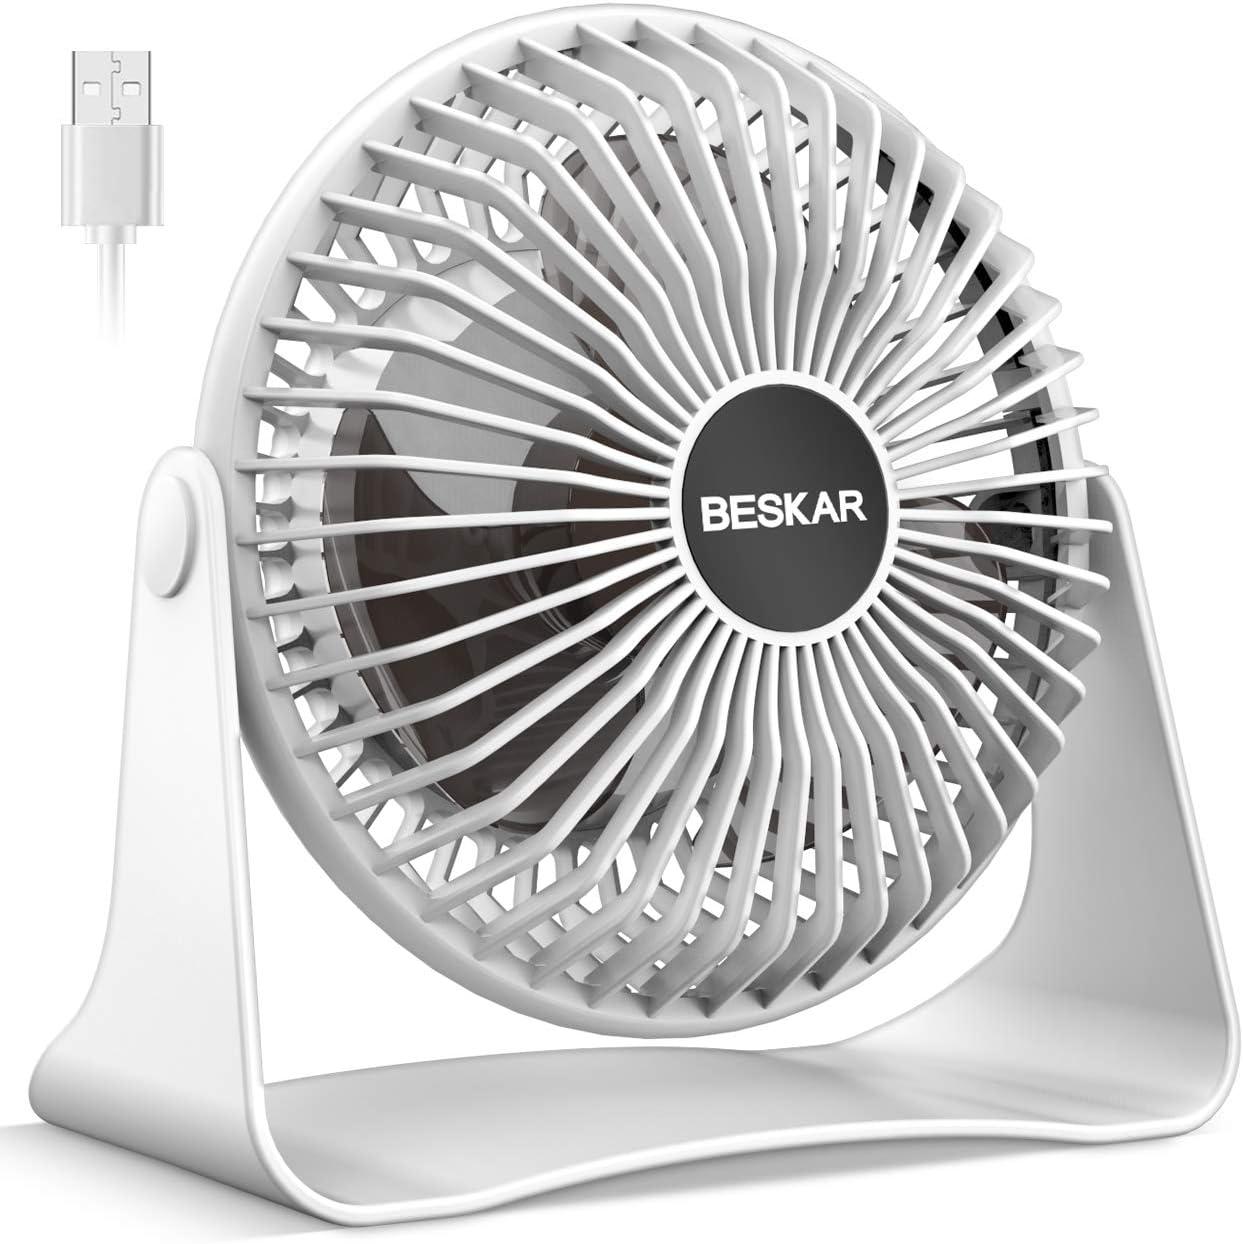 USB Desk Fan 6 Inch Mini Desk Fan with USB Cable,Portable Personal Fan Colourful